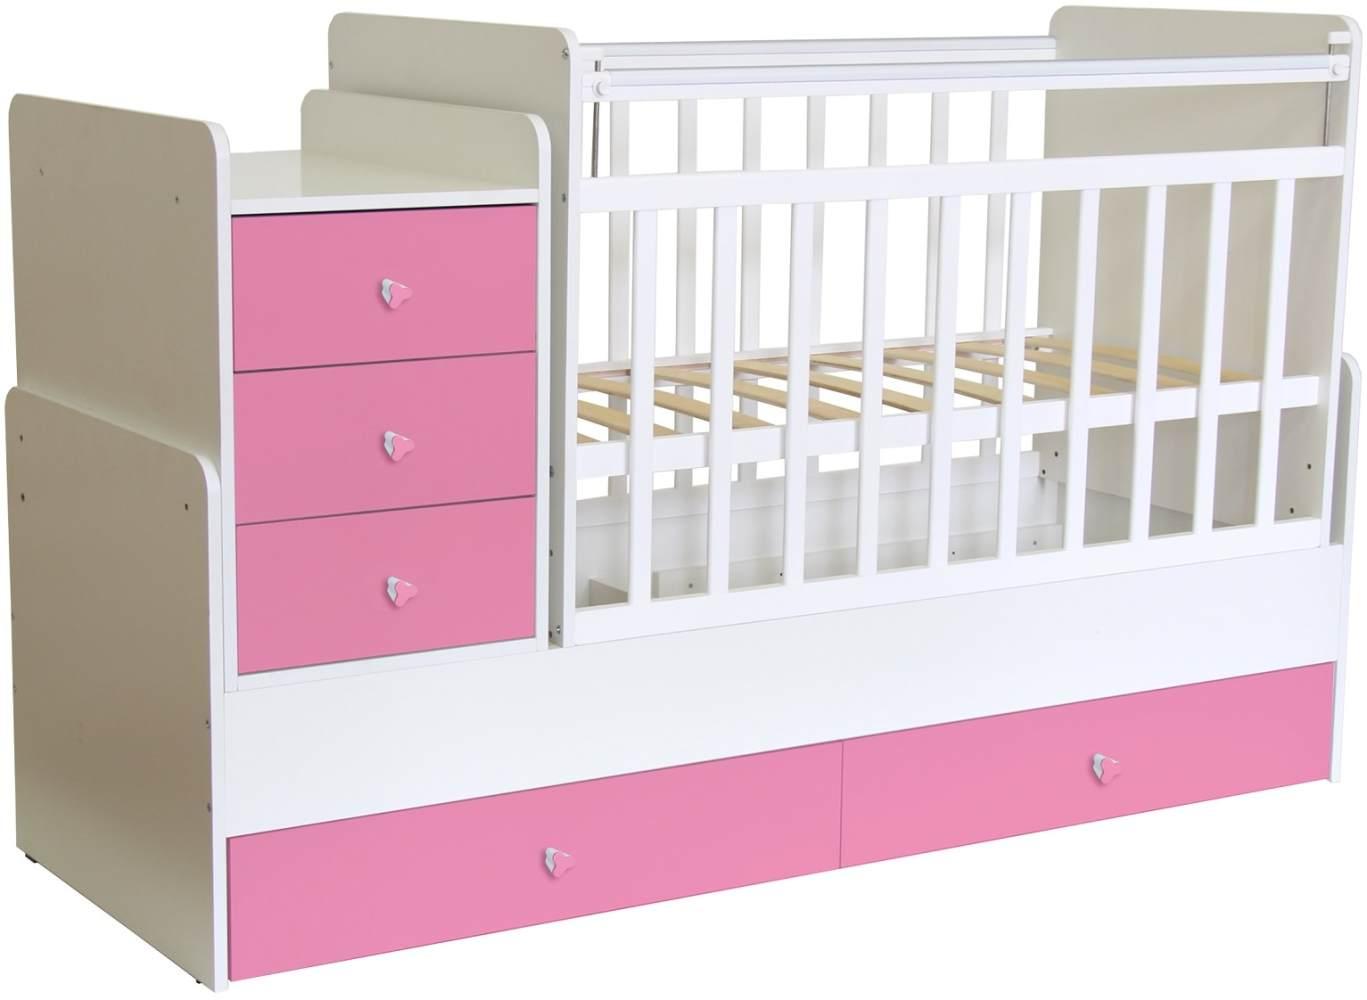 Polini Kids 'Simple 1100' Kombi-Kinderbett 60 x 120/170 cm, weiß/rosa, höhenverstellbar, mit Schaukelfunktion, inkl. Kommode Bild 1